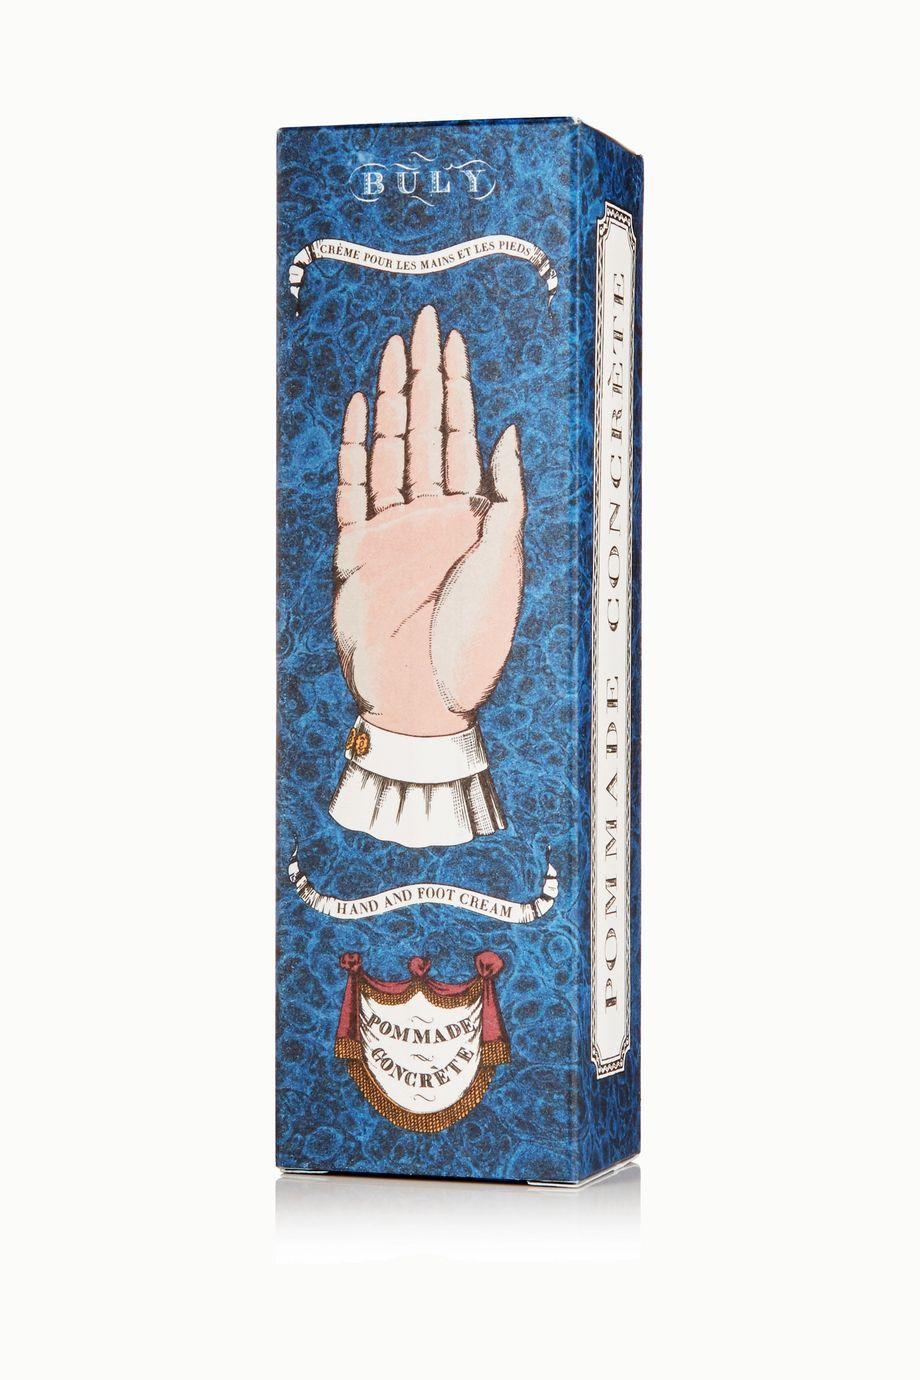 Buly 1803 Pommade Concrète balm, 75ml